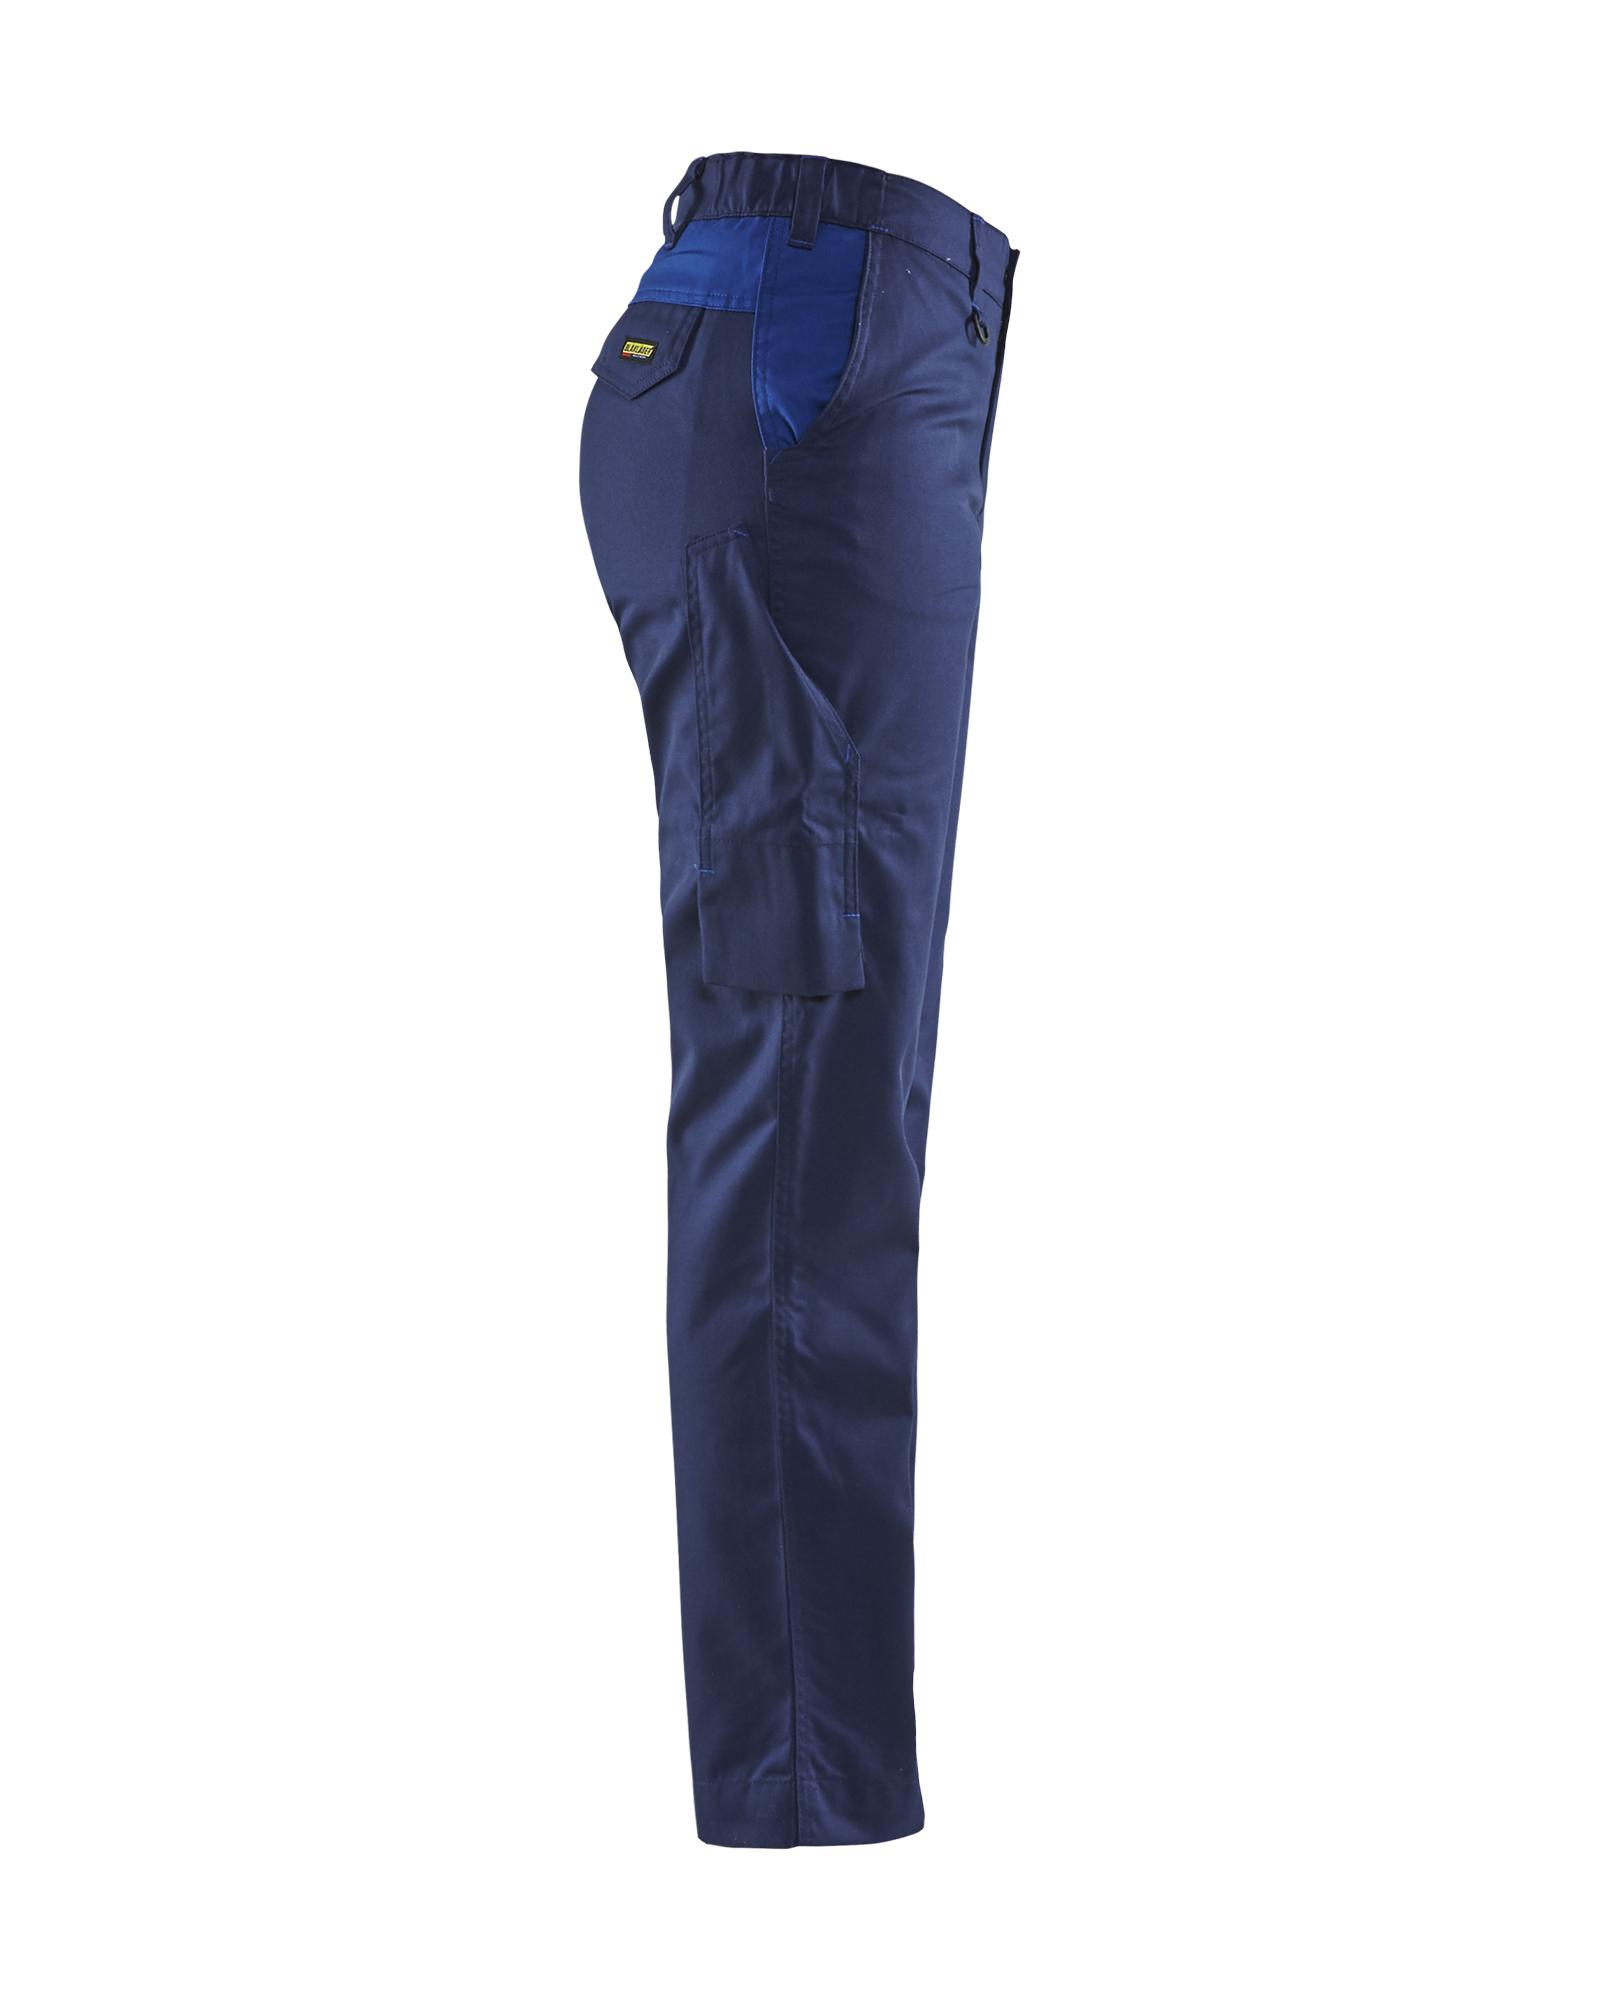 Bukse industri dame (71041800) Blaklader